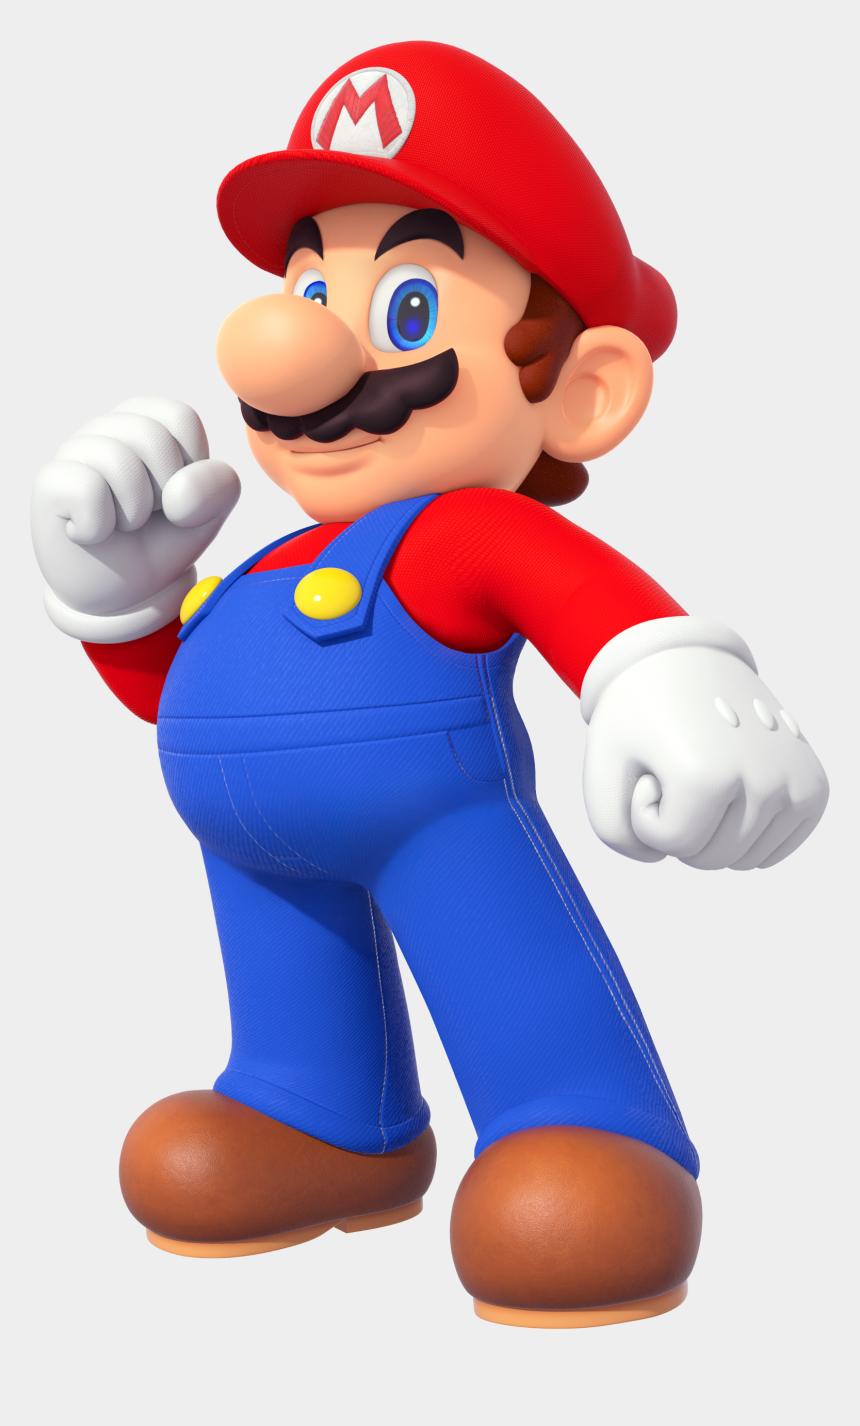 mario brothers clipart, Cartoons - Mario Bros Clipart Morio - Mario Party The Top 100 Mario